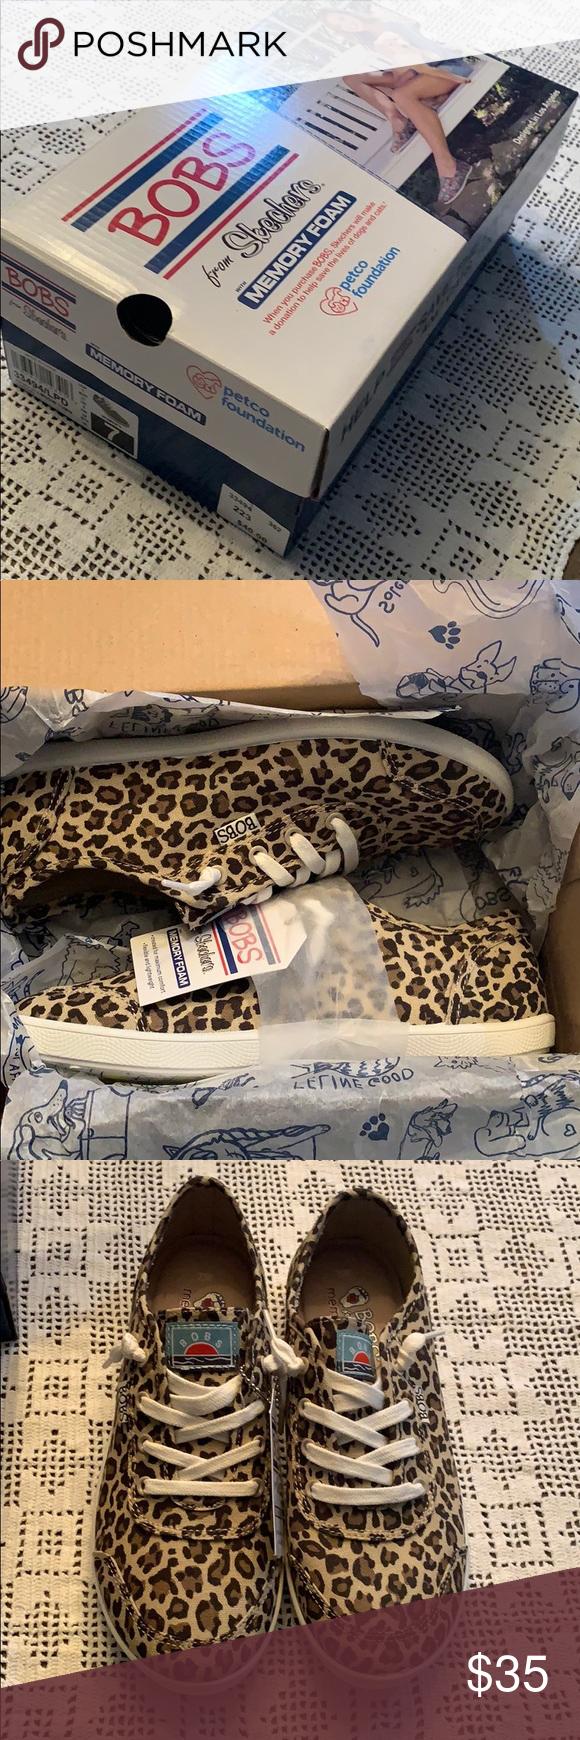 Skechers BOBS Leopard Print slip on